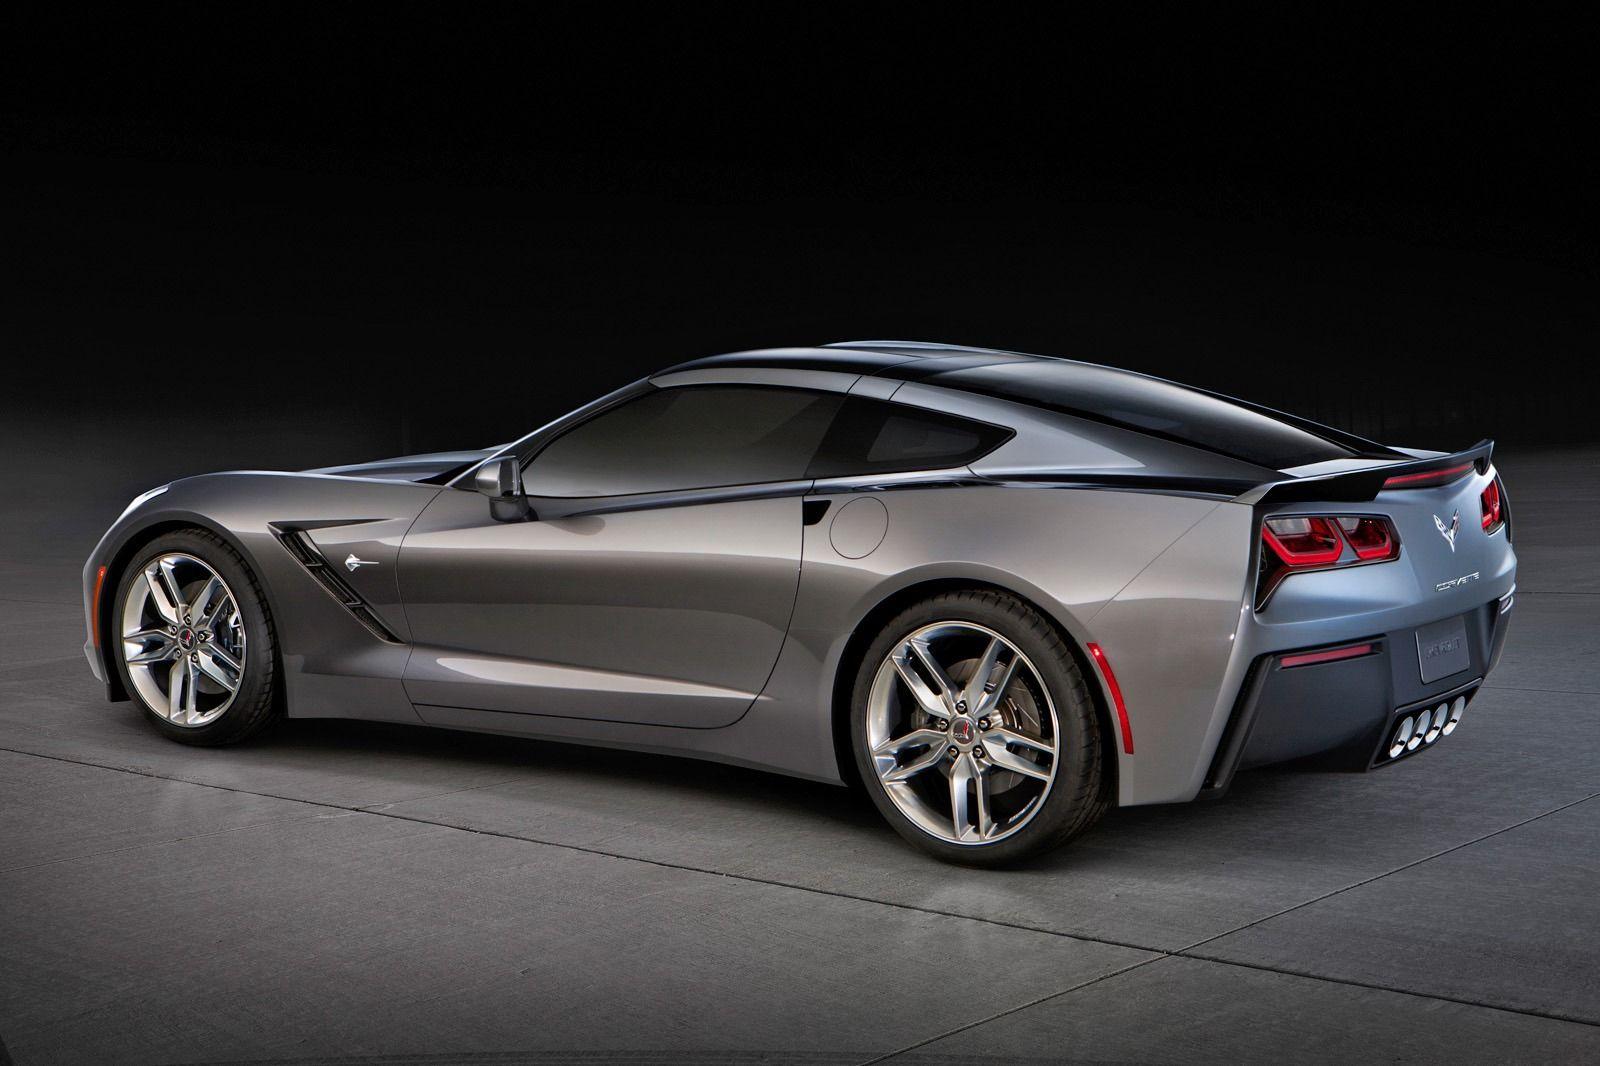 GM registra la marca Corvette E-Ray, ¿se acerca el 'Vette eléctrico? 1